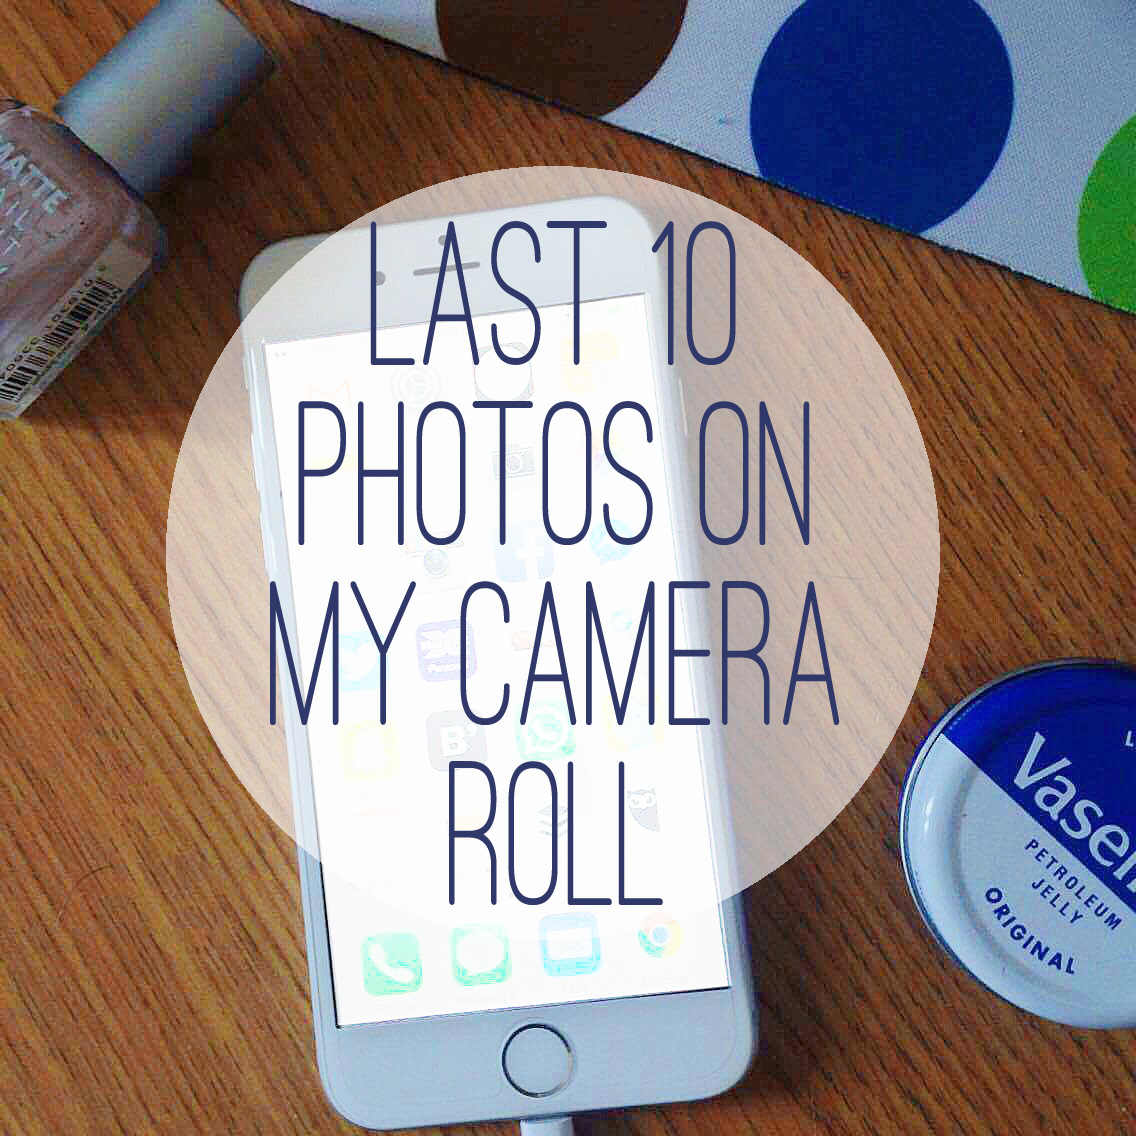 Last 10 Photos On My Camera Roll Promo Photo.